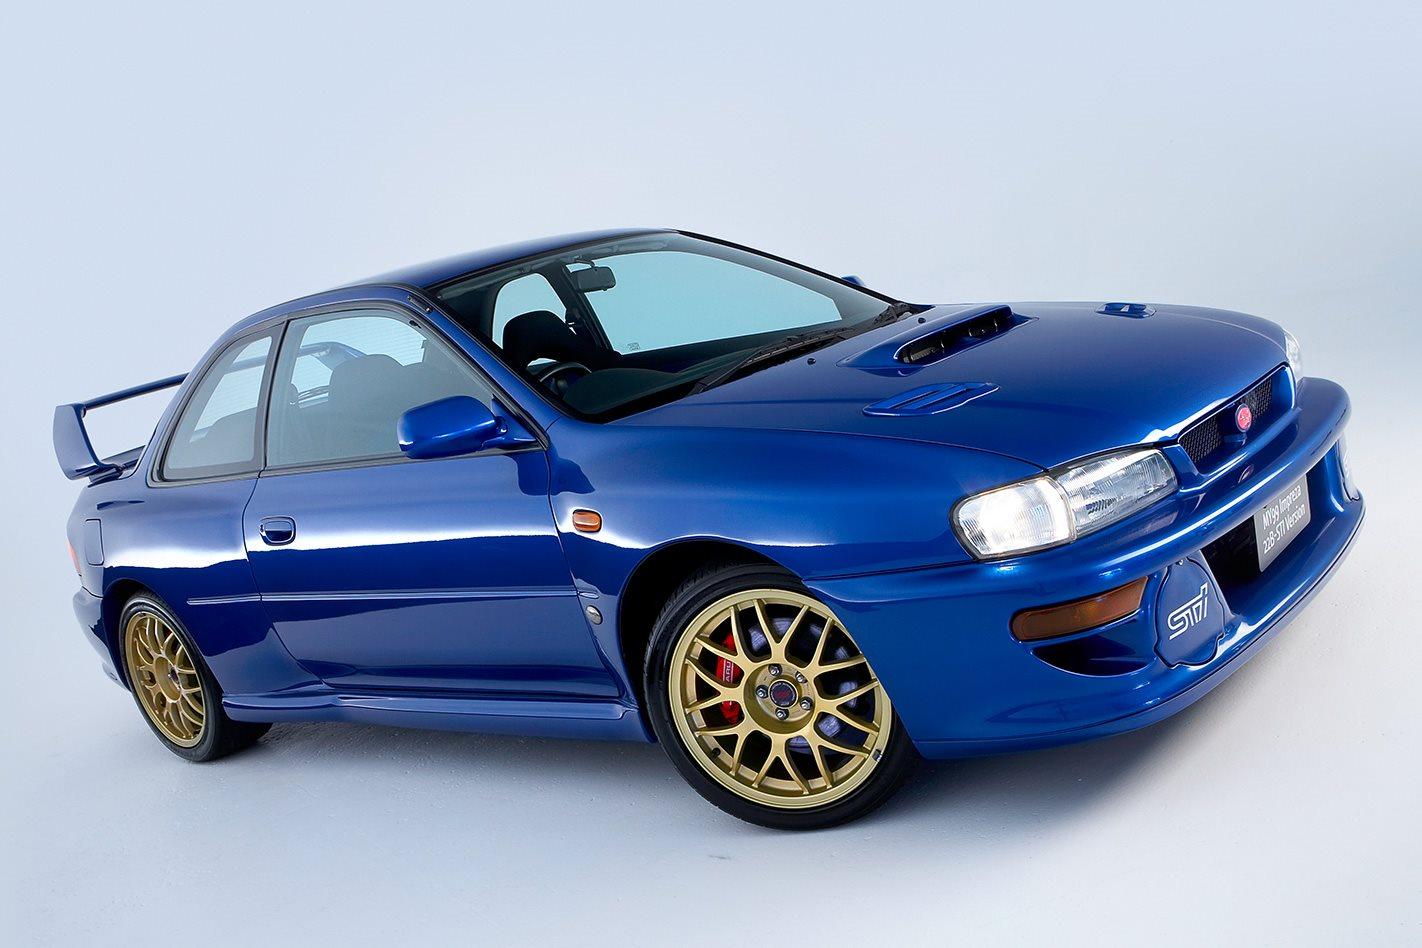 1999 Subaru 22b Sti Greatest Impreza Ever Motor